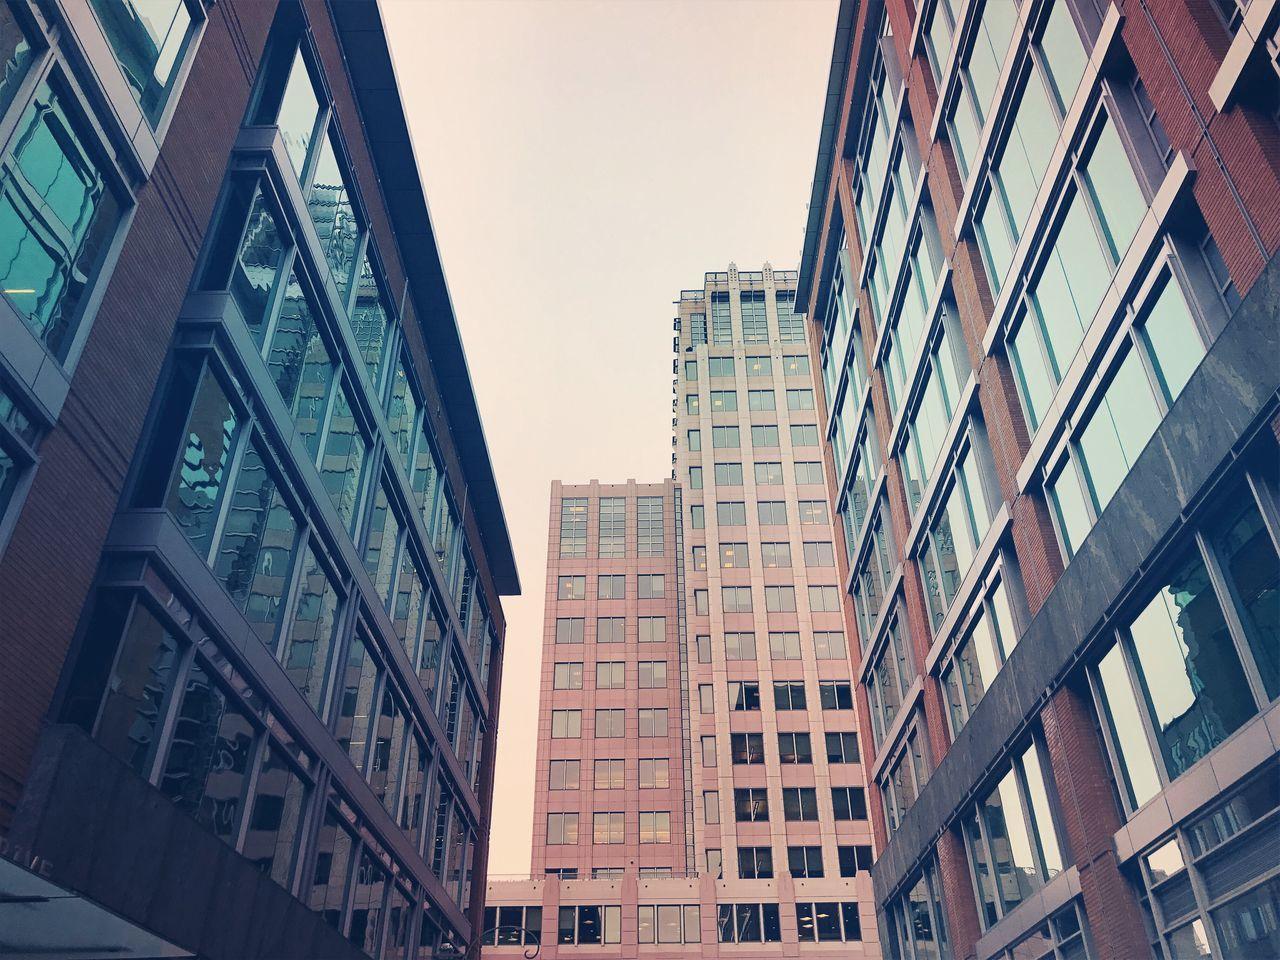 Beautiful stock photos of feuer, architecture, built structure, building exterior, city